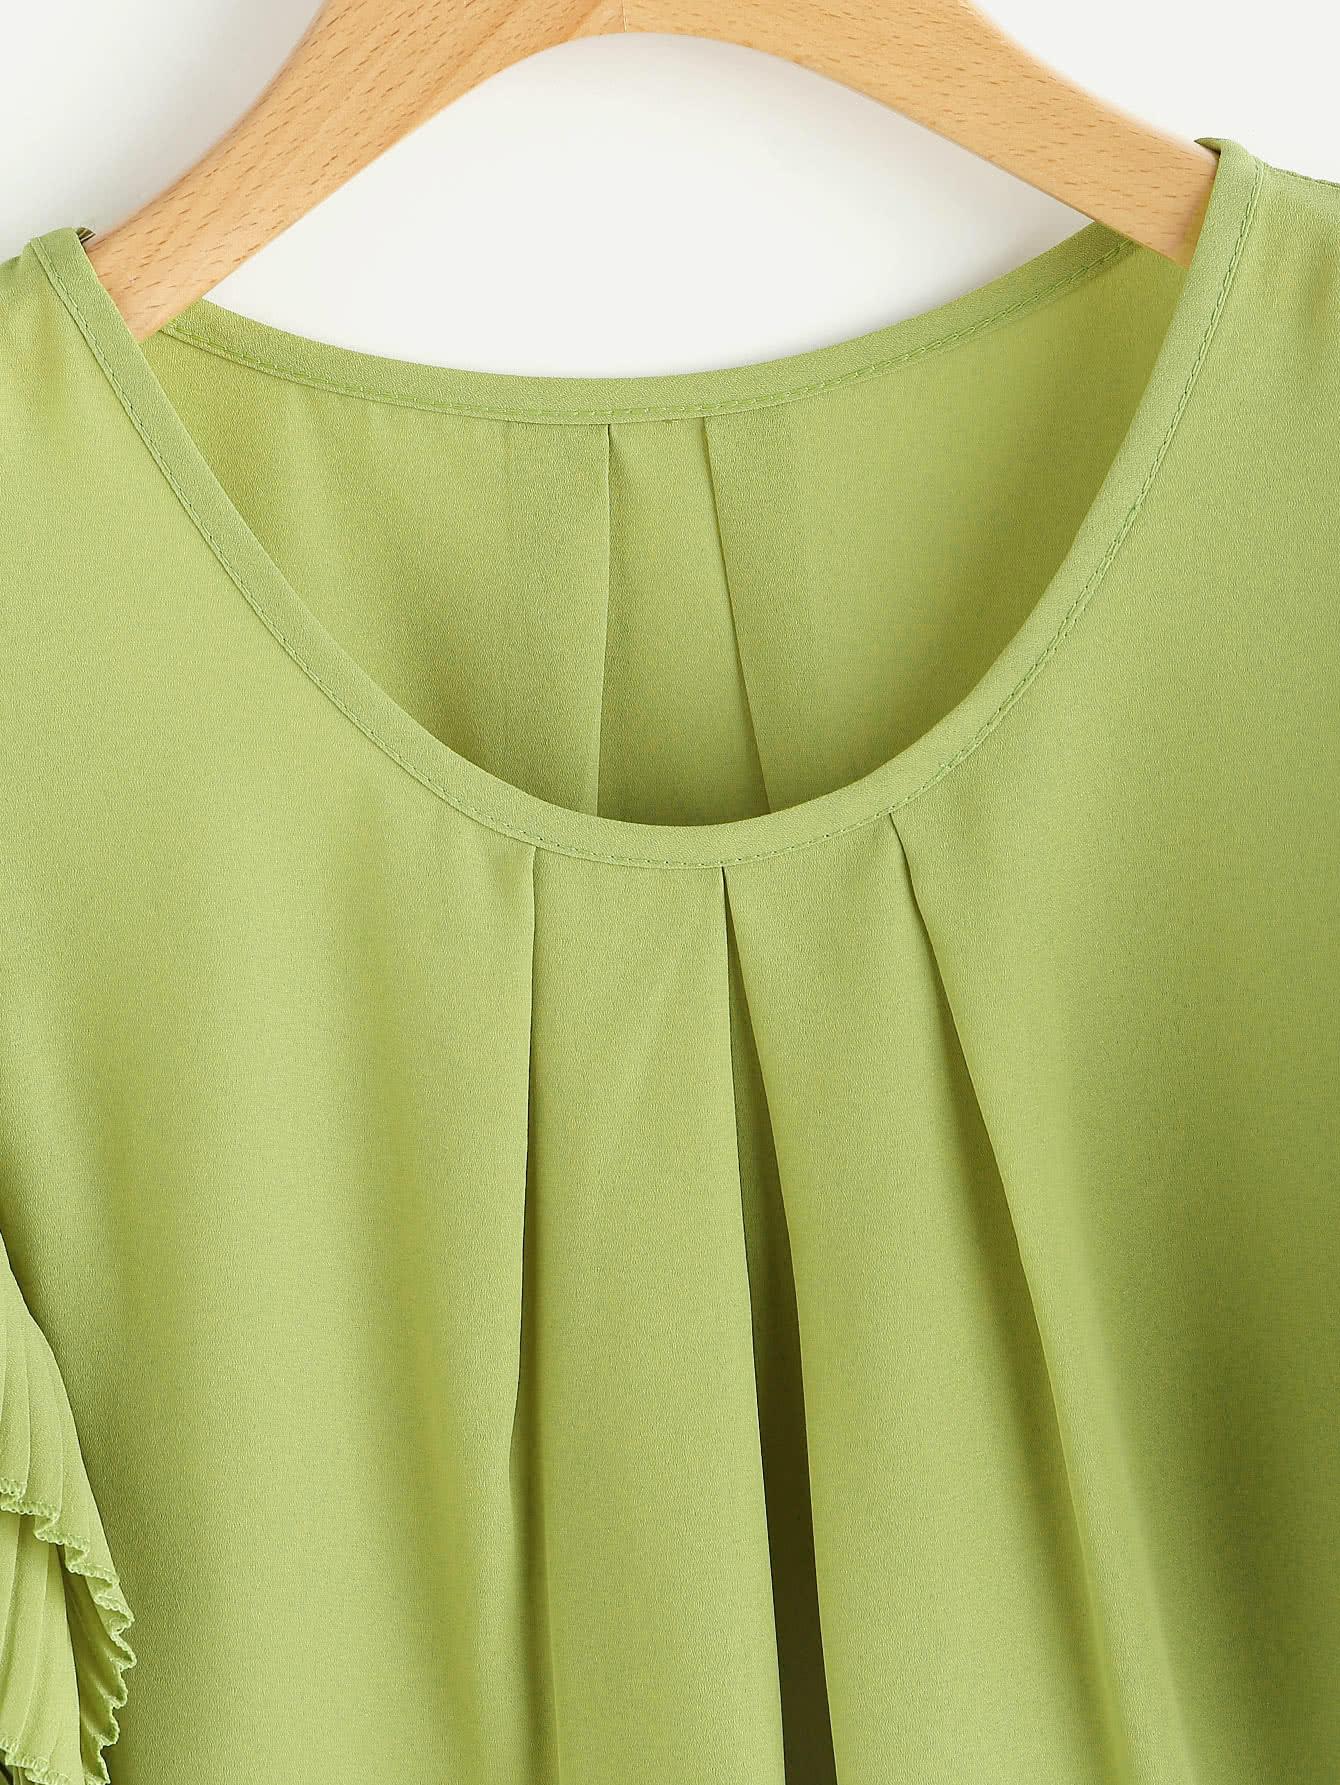 blouse170530007_2